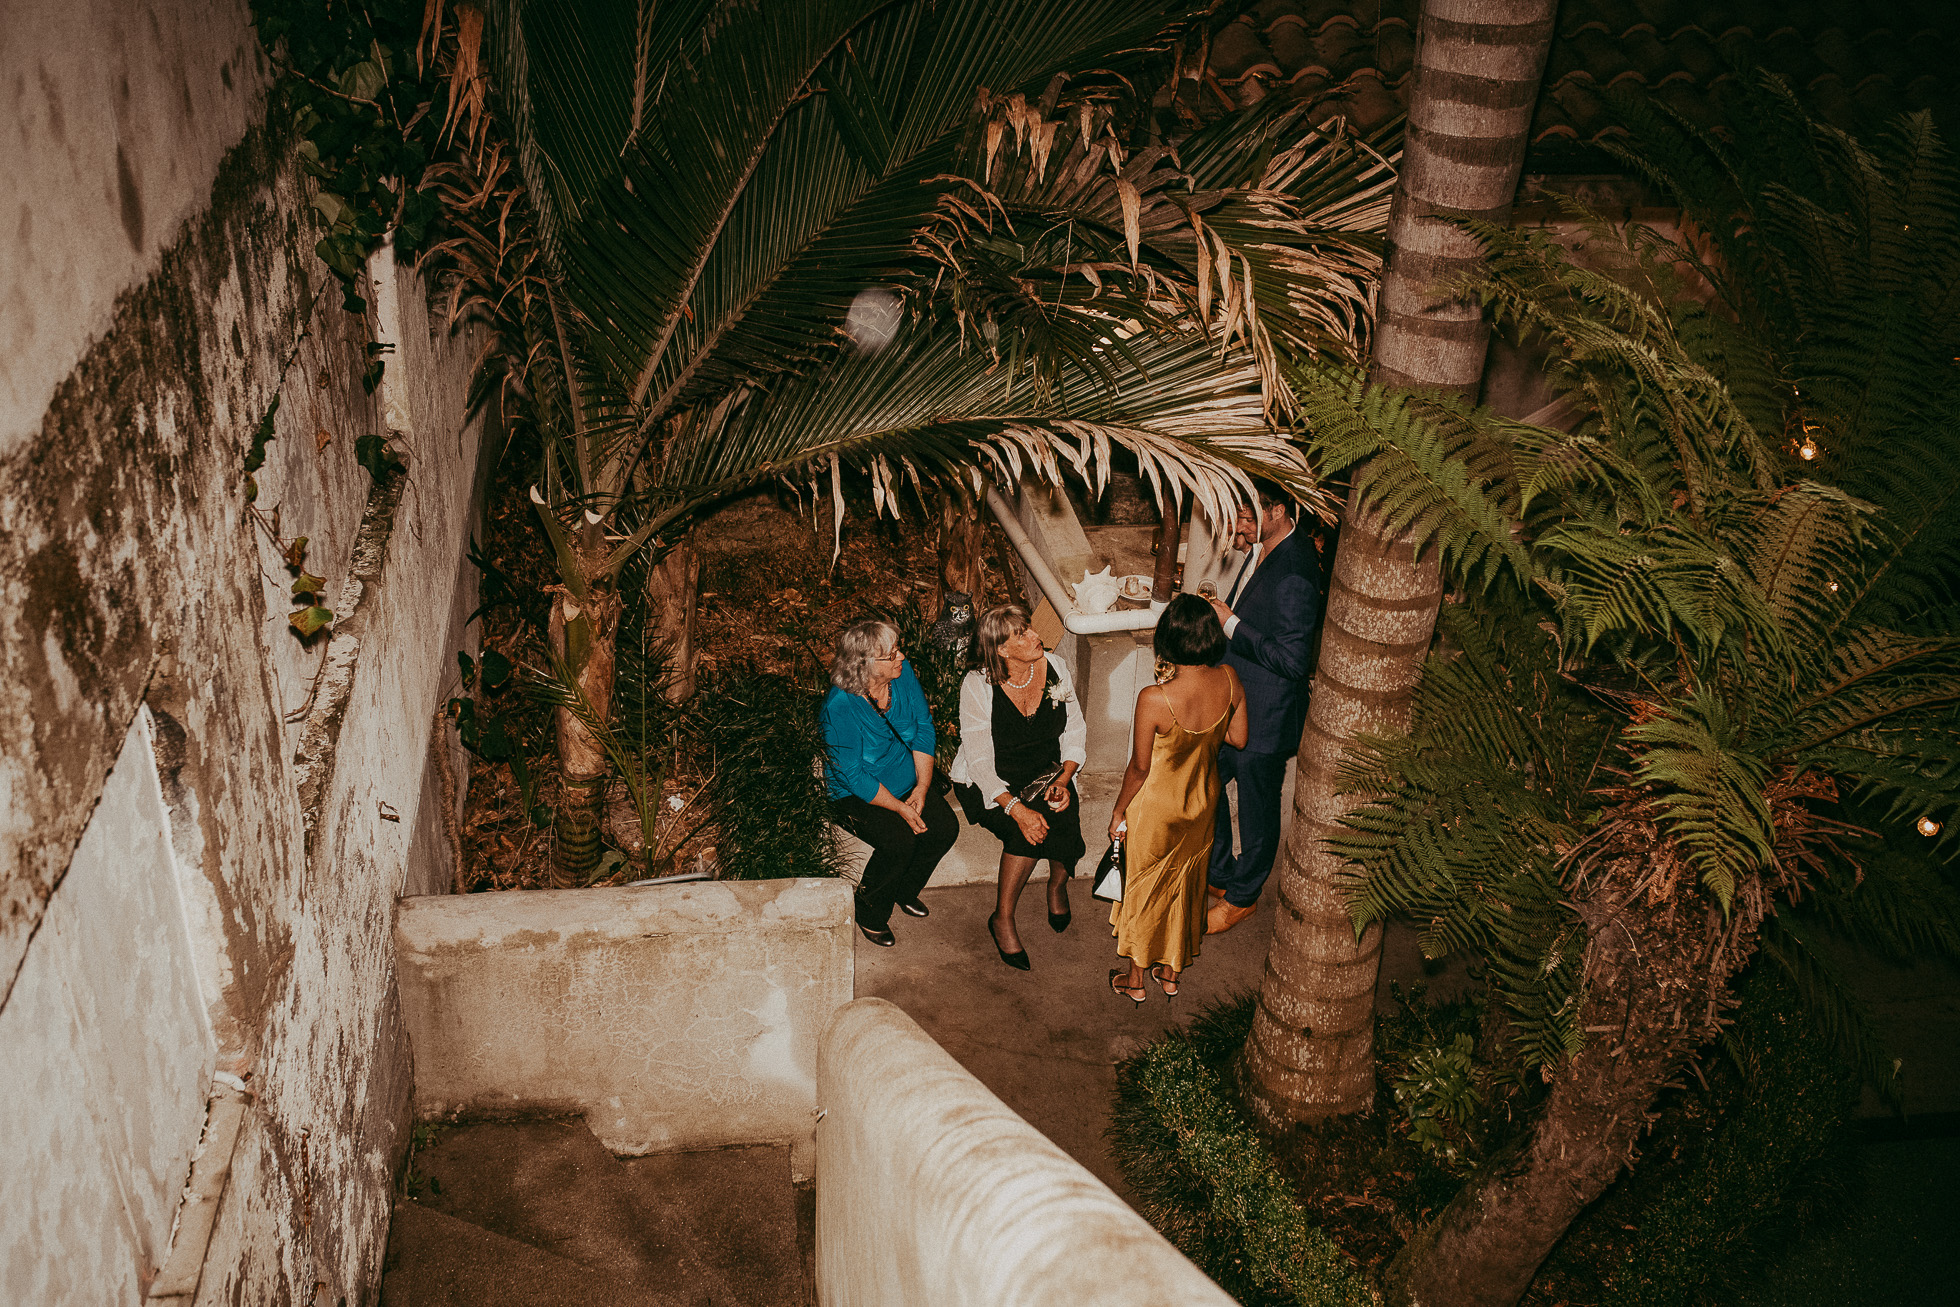 Mantells - Auckland city wedding venue - photographer